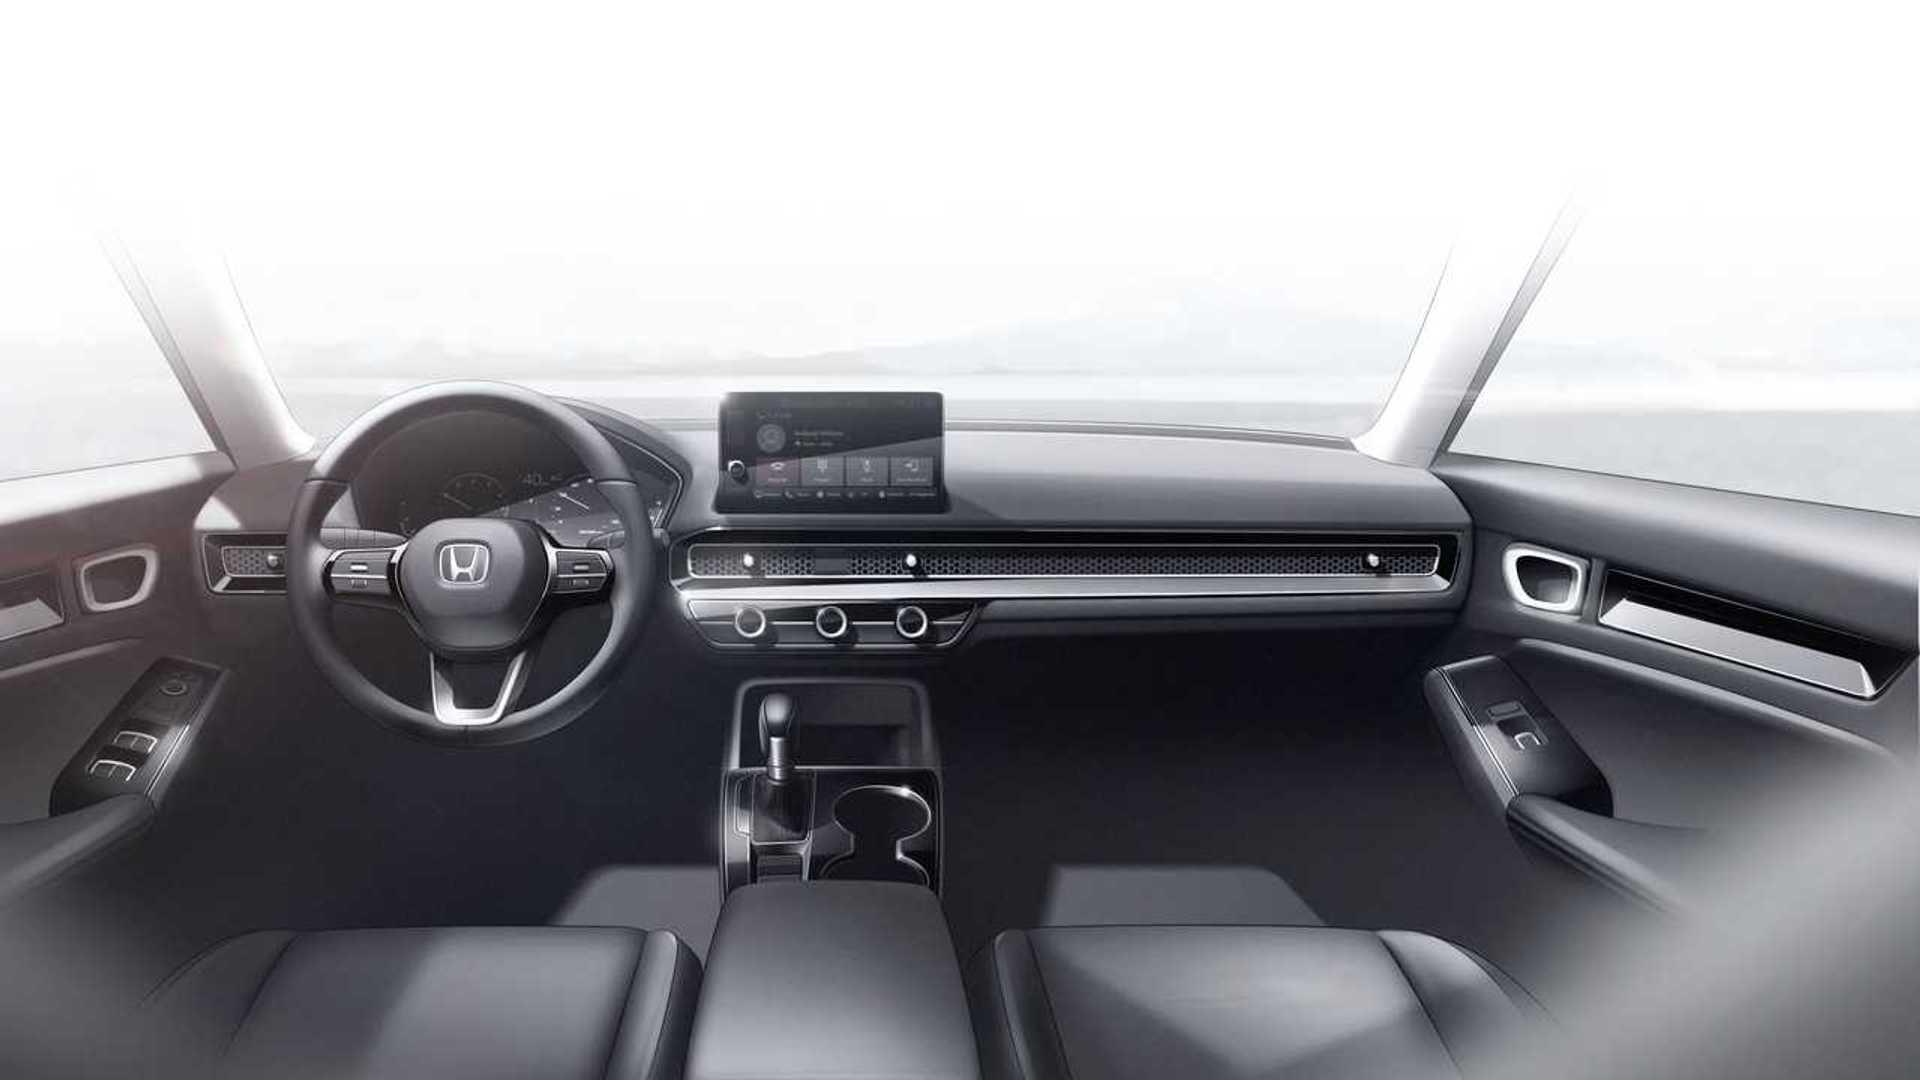 2022 Honda Civic Prototype Bold Looks Better Tech More Safety